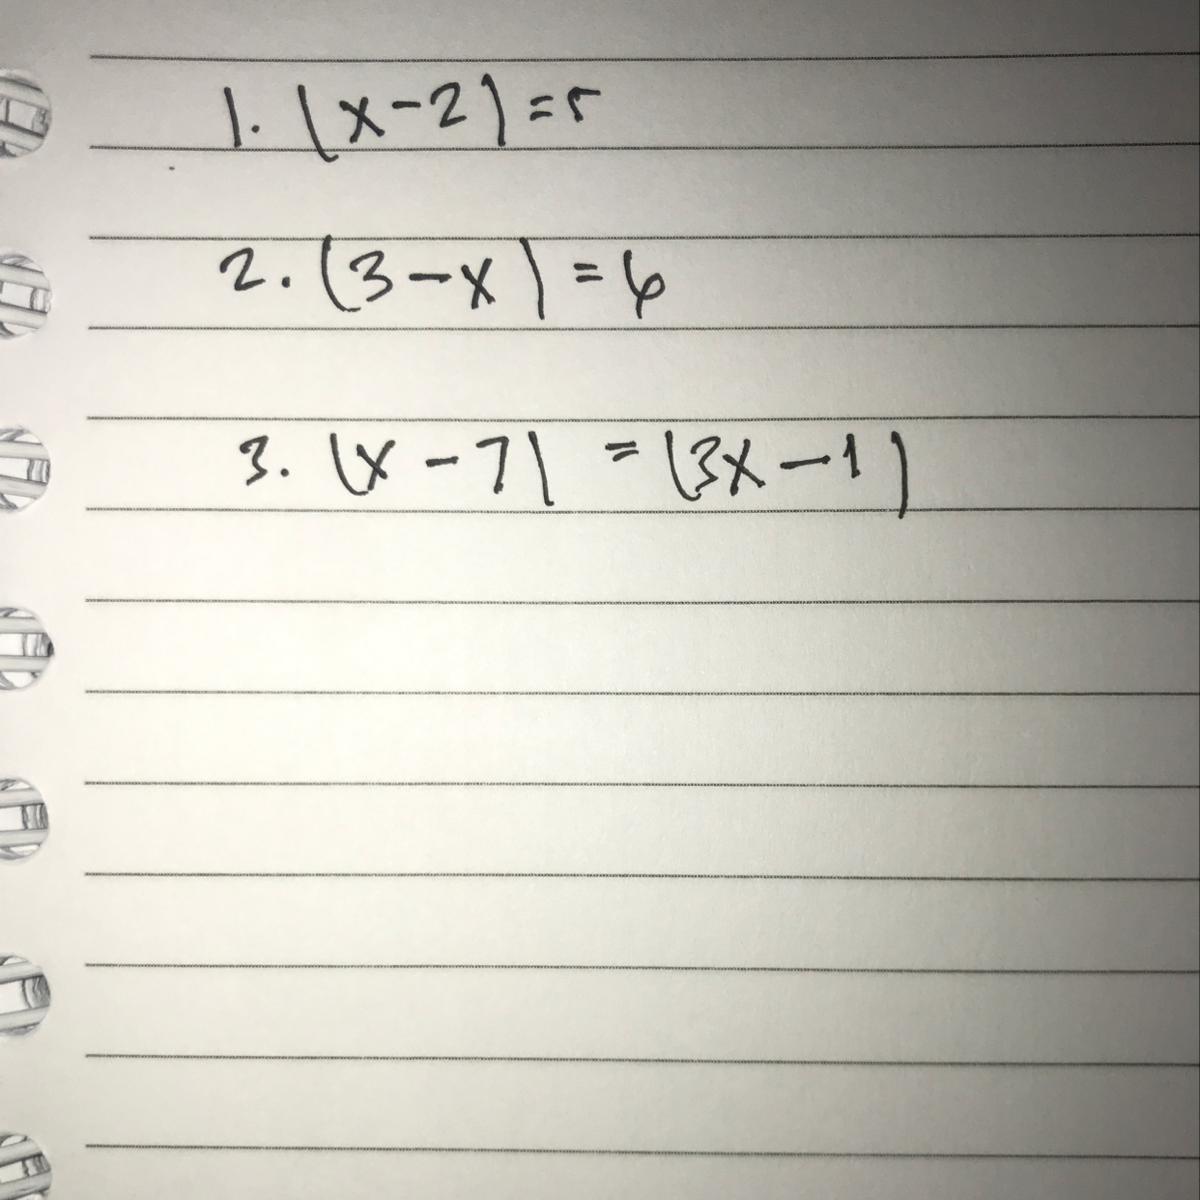 Tentukan Nilai X Yang Memenuhi Persamaan Nilai Mutlak Berikut Ini Brainly Co Id